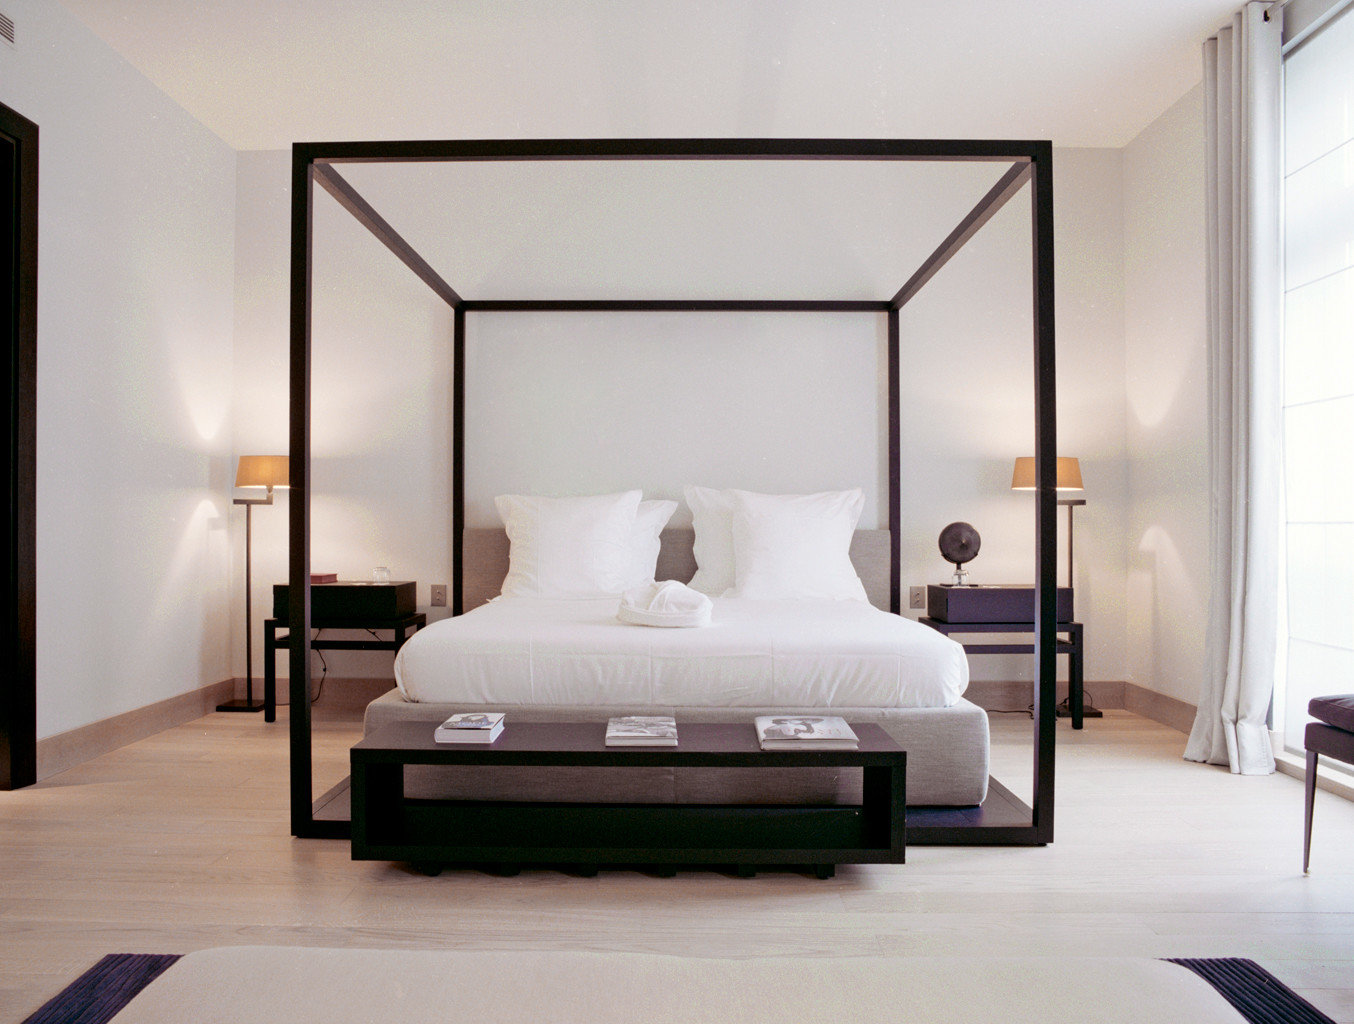 Bedroom Boutique City Elegant France Hotels Luxury Paris Suite wall indoor floor bed room furniture bed frame interior design living room hotel Design wardrobe lamp